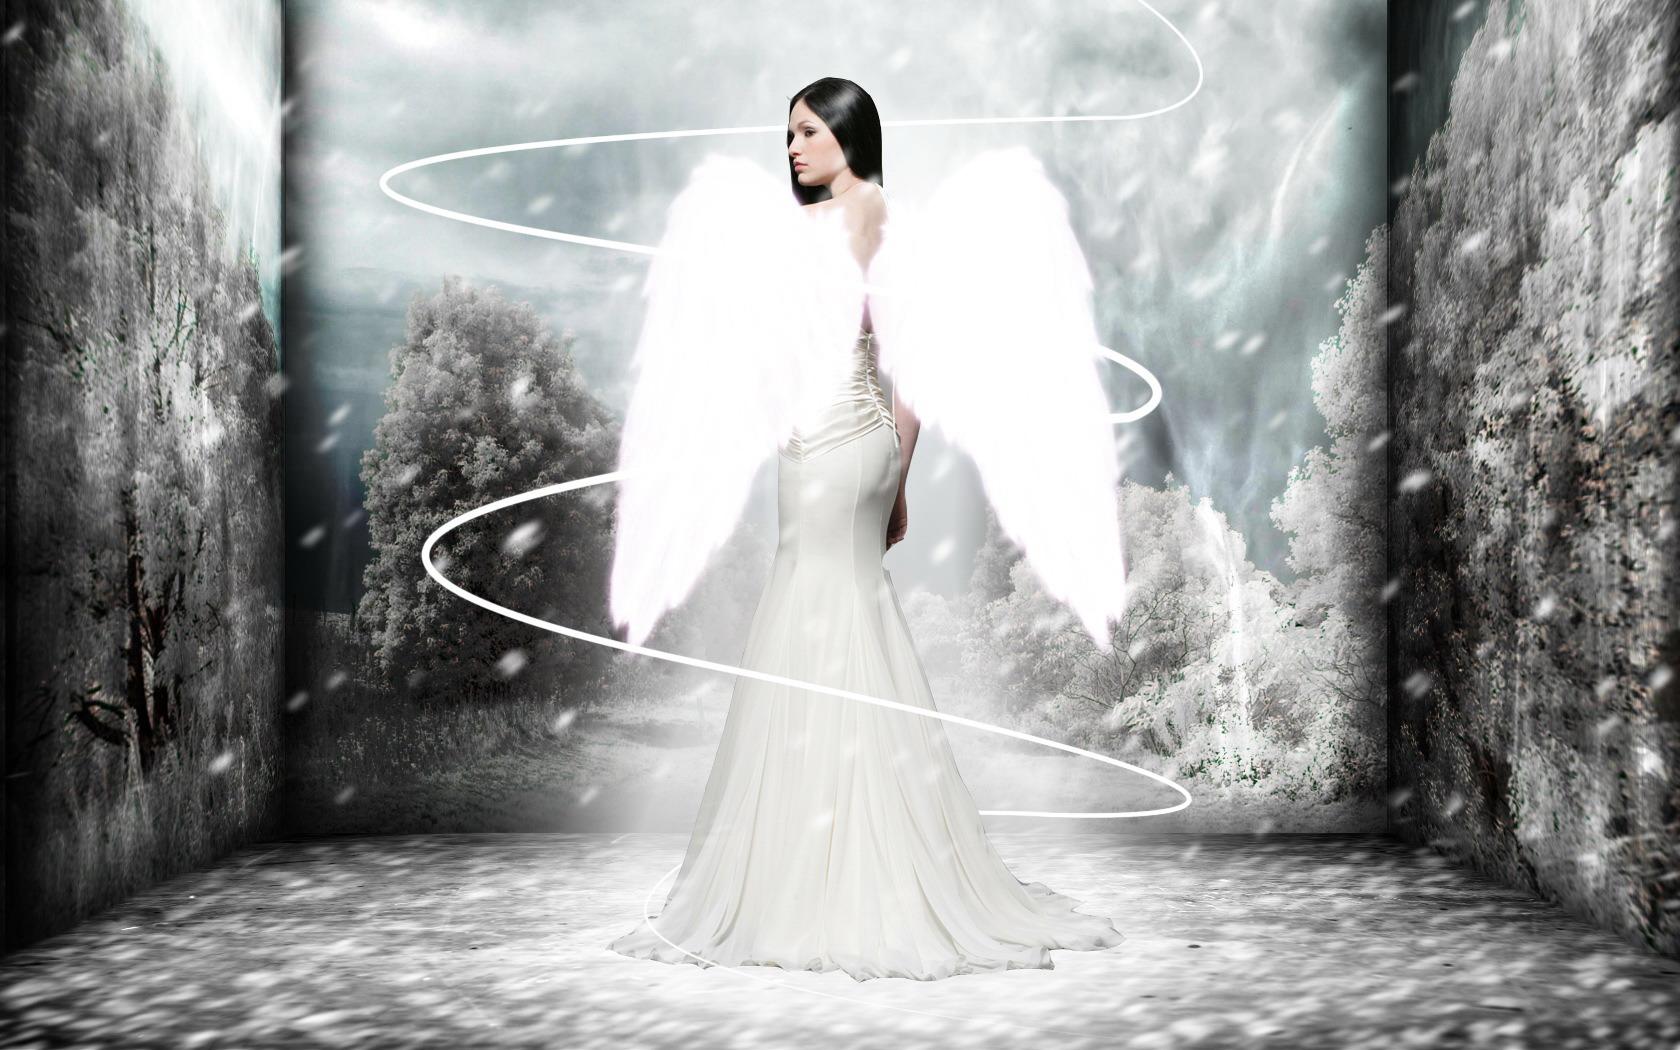 Фэнтези - Ангел  Lovely Фэнтези Wings Обои